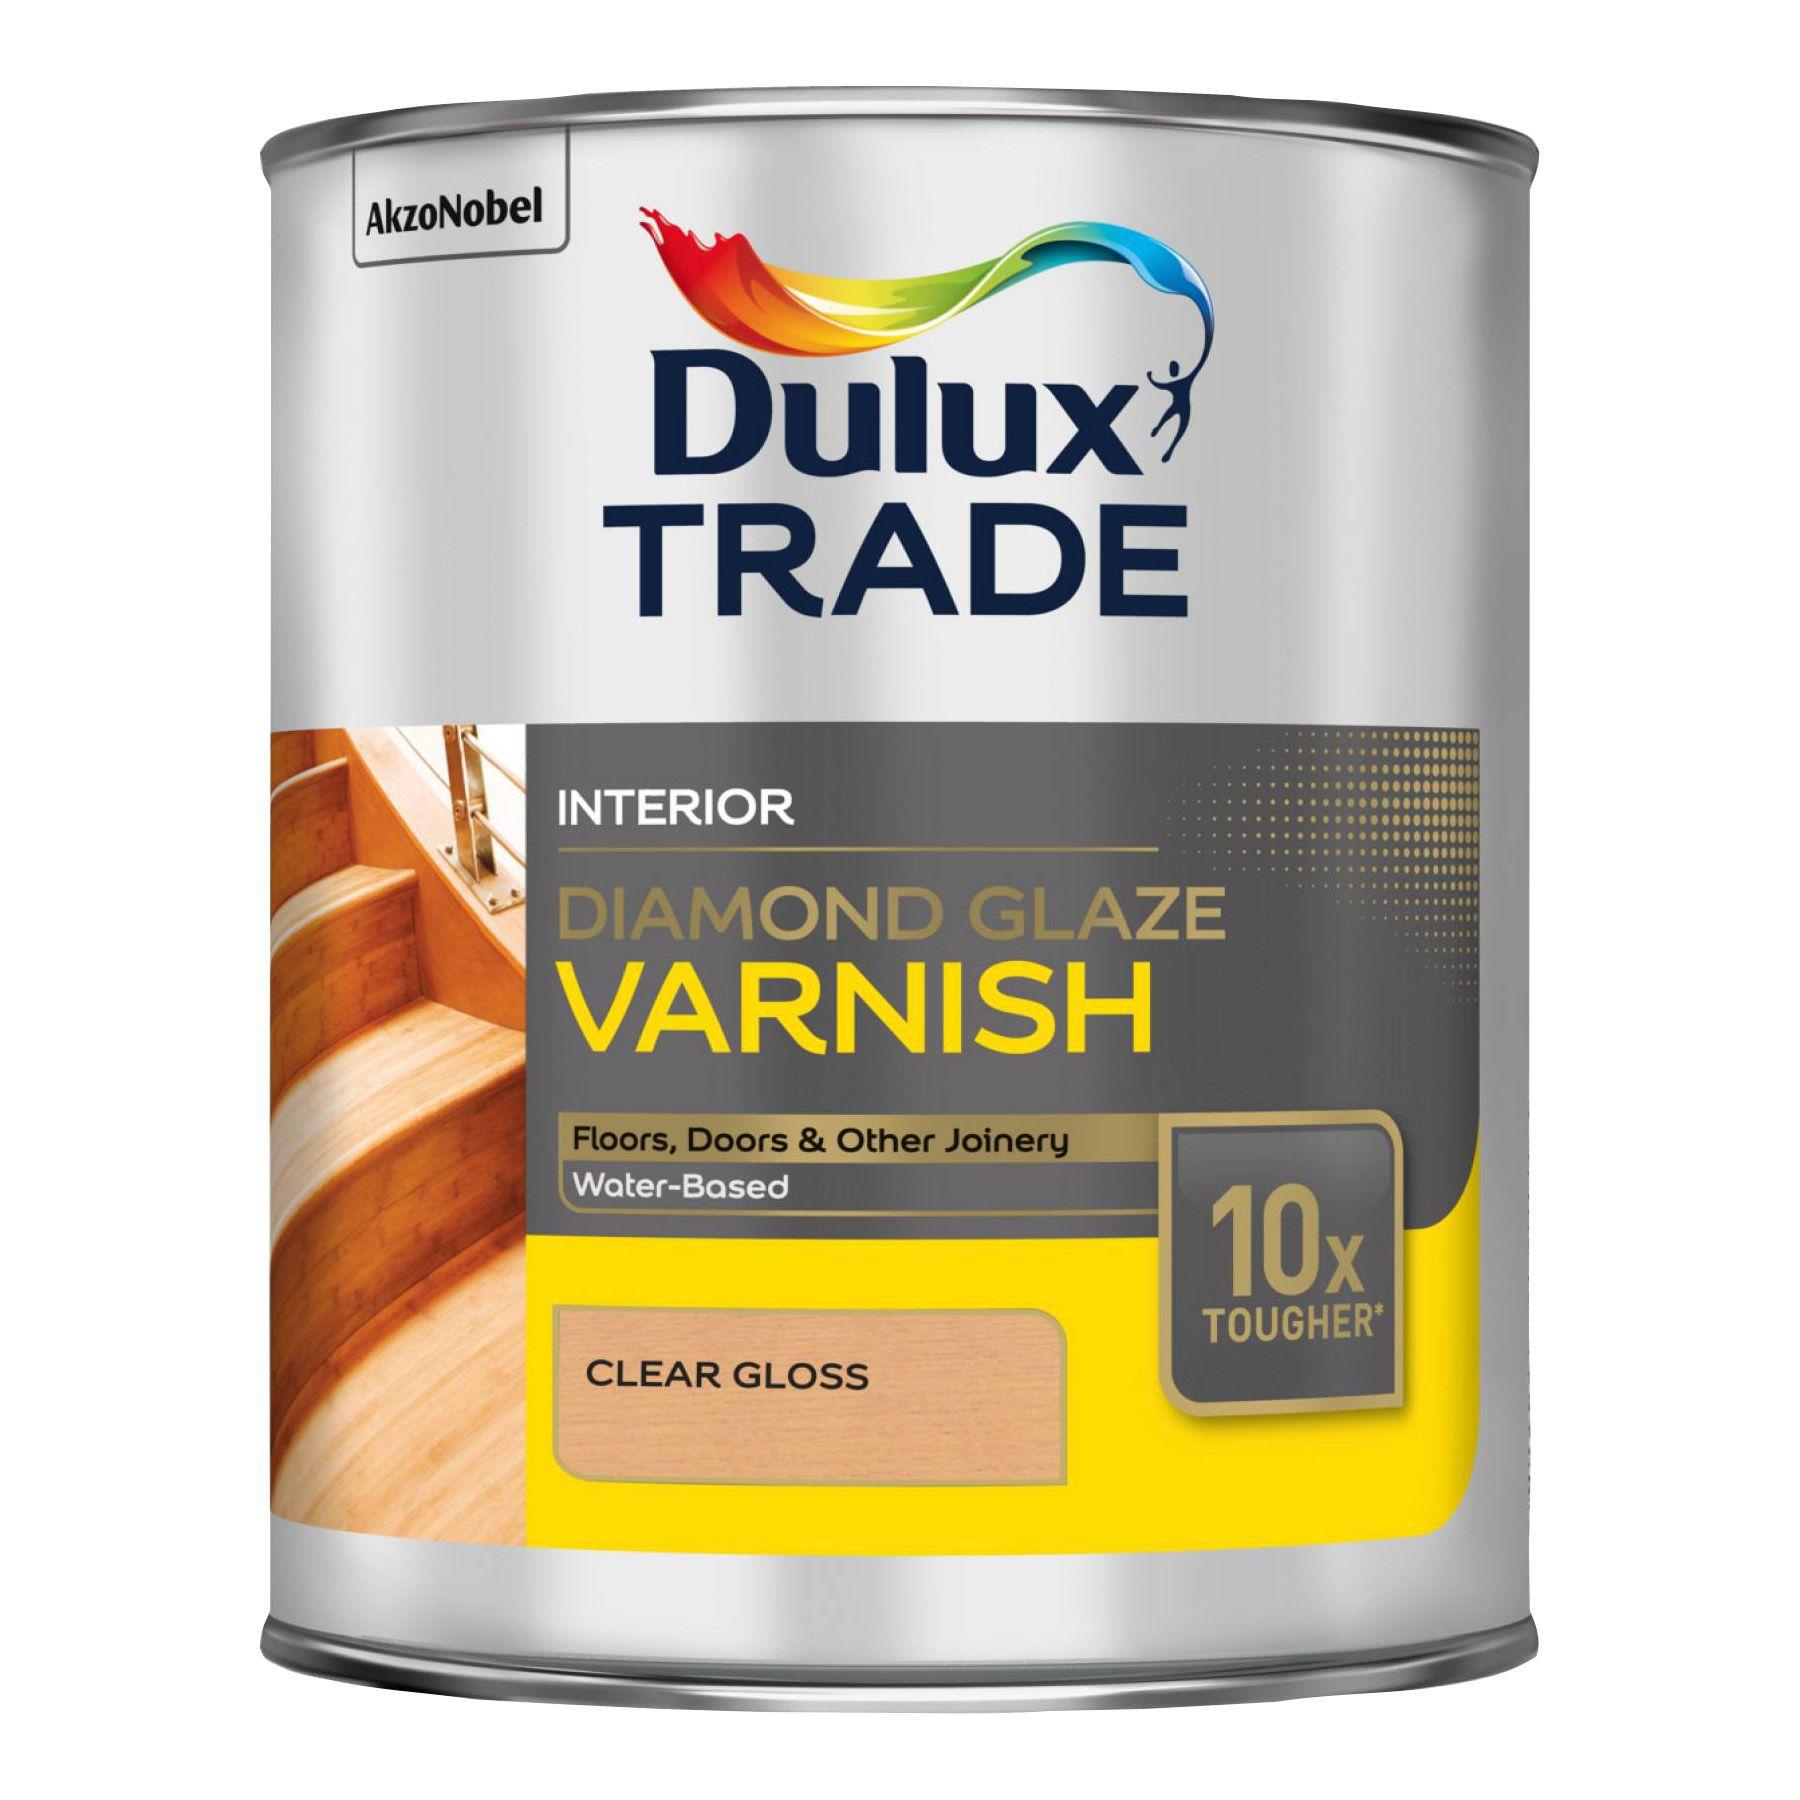 Dulux Trade Clear Gloss Varnish 1000ml